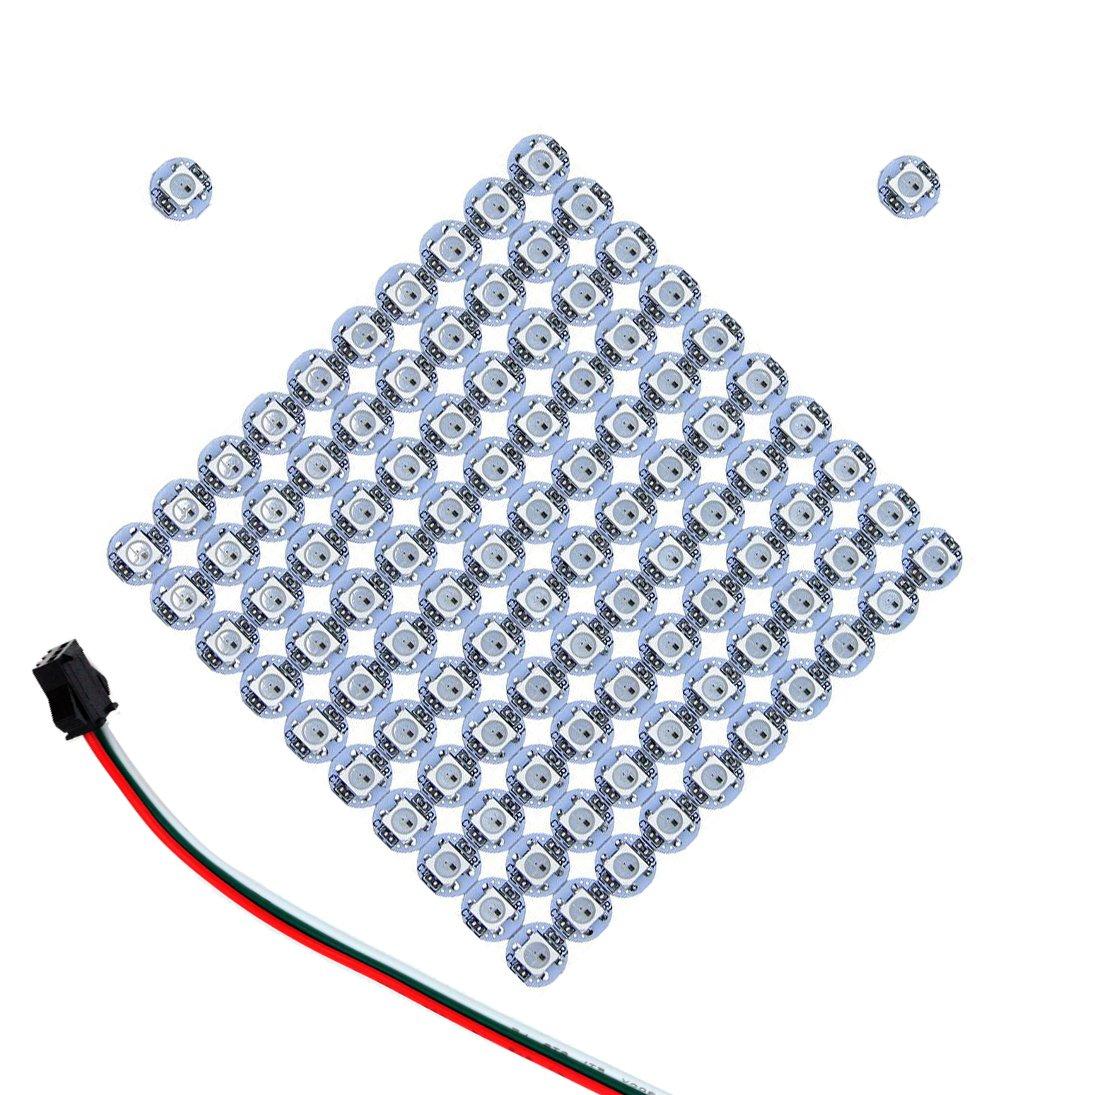 INVOLT 100PCS WS2812B Addressable LED Pixel Light, 5V Full Color 5050 RGB Module with WS2812B IC Built-in, on White Heatsink PCB Board